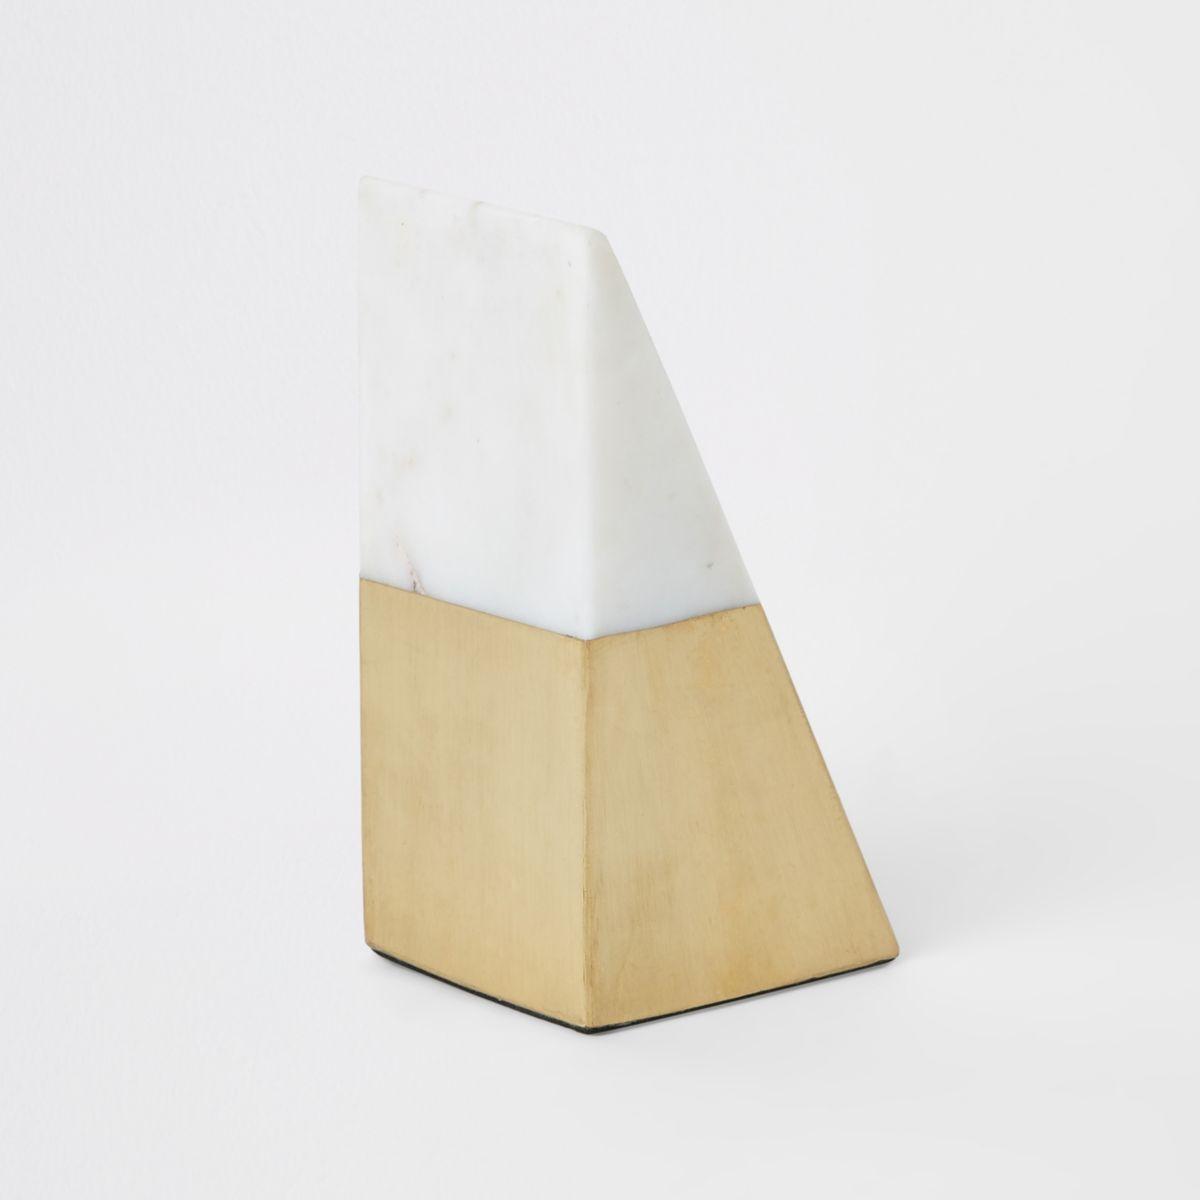 Triangular marble book end